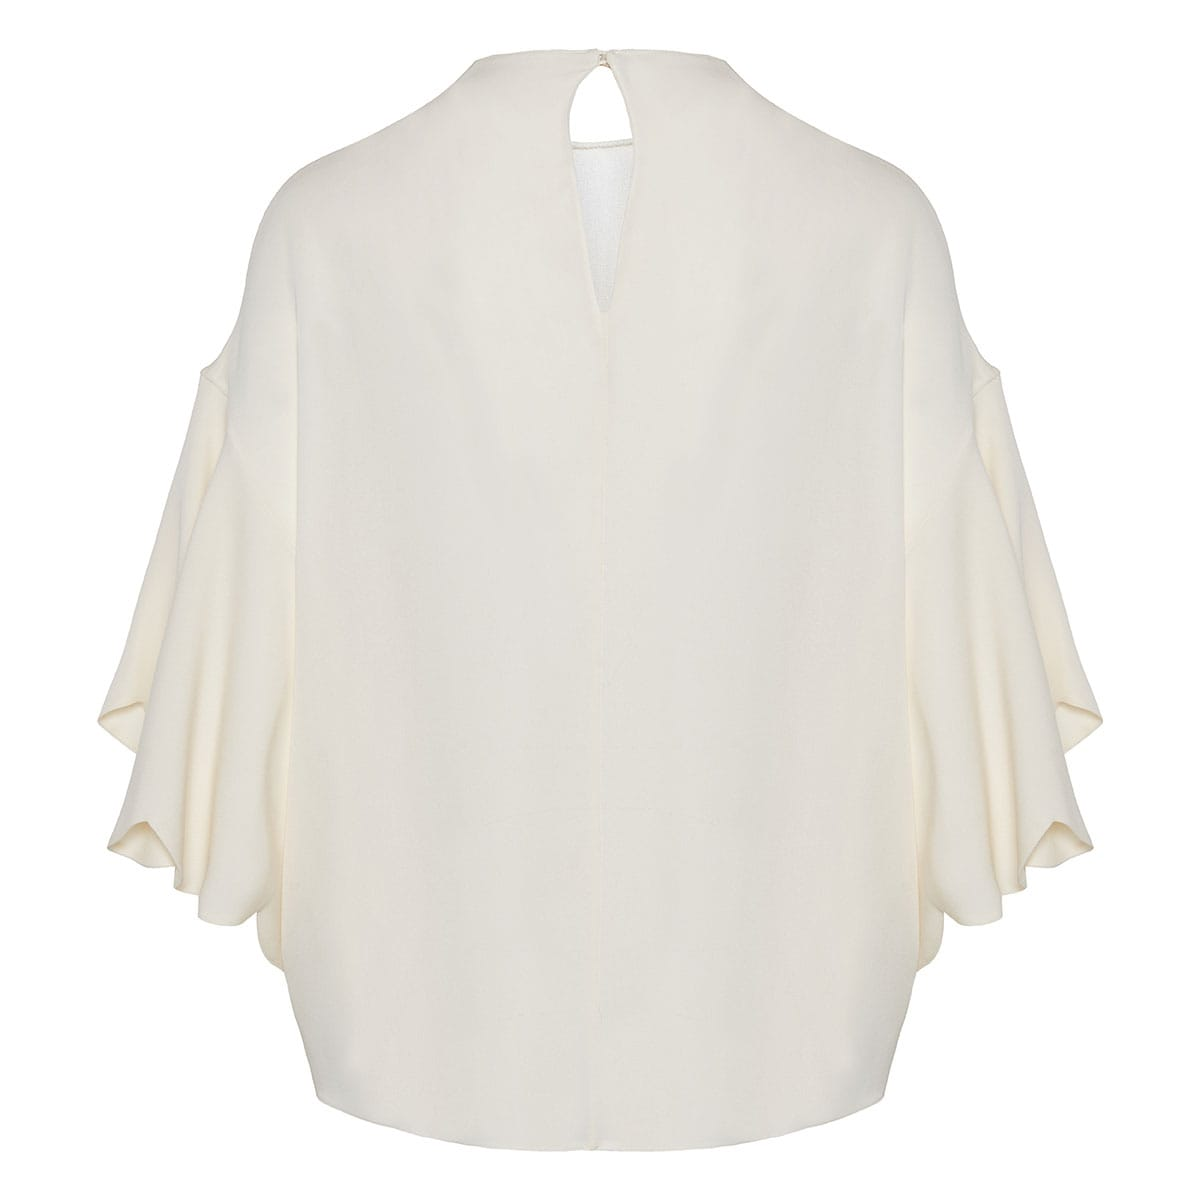 Ruffle-sleeved silk crepe blouse